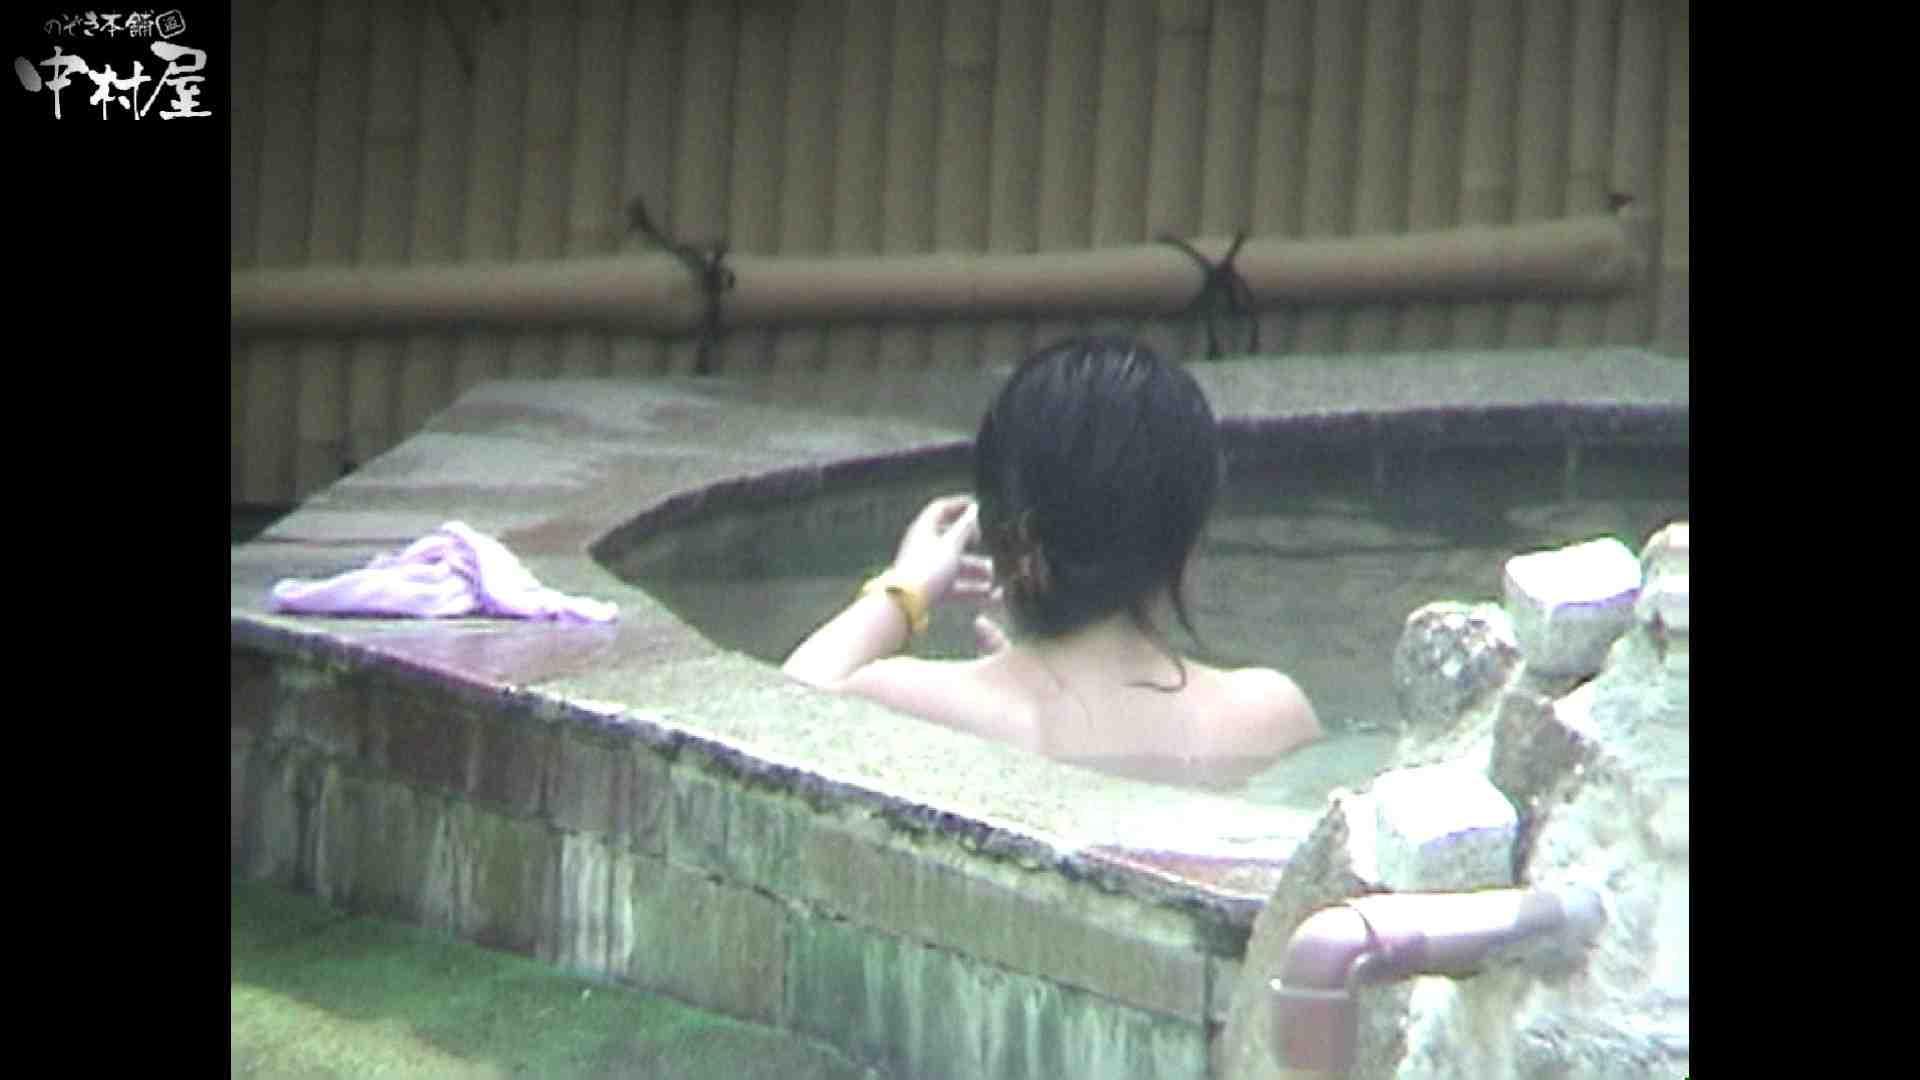 Aquaな露天風呂Vol.936 盗撮映像  110Pix 7